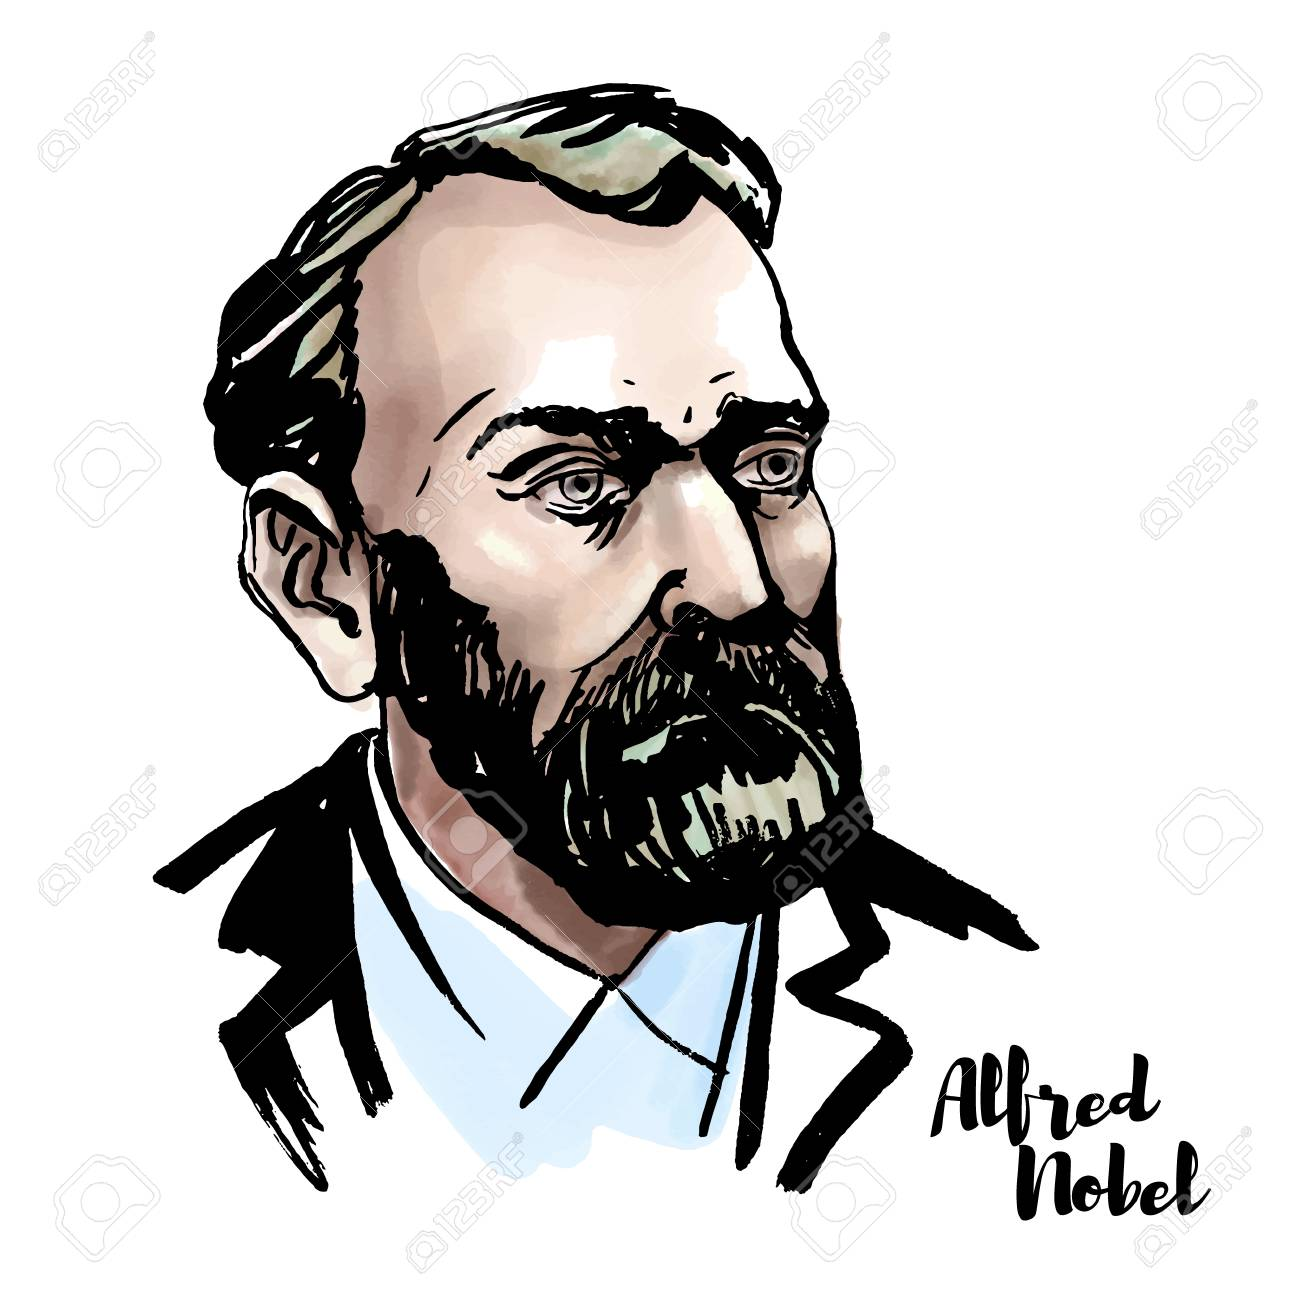 Alfred Nobel watercolor vector portrait with ink contours. Swedish chemist, engineer, inventor, businessman, and philanthropist. - 110435005